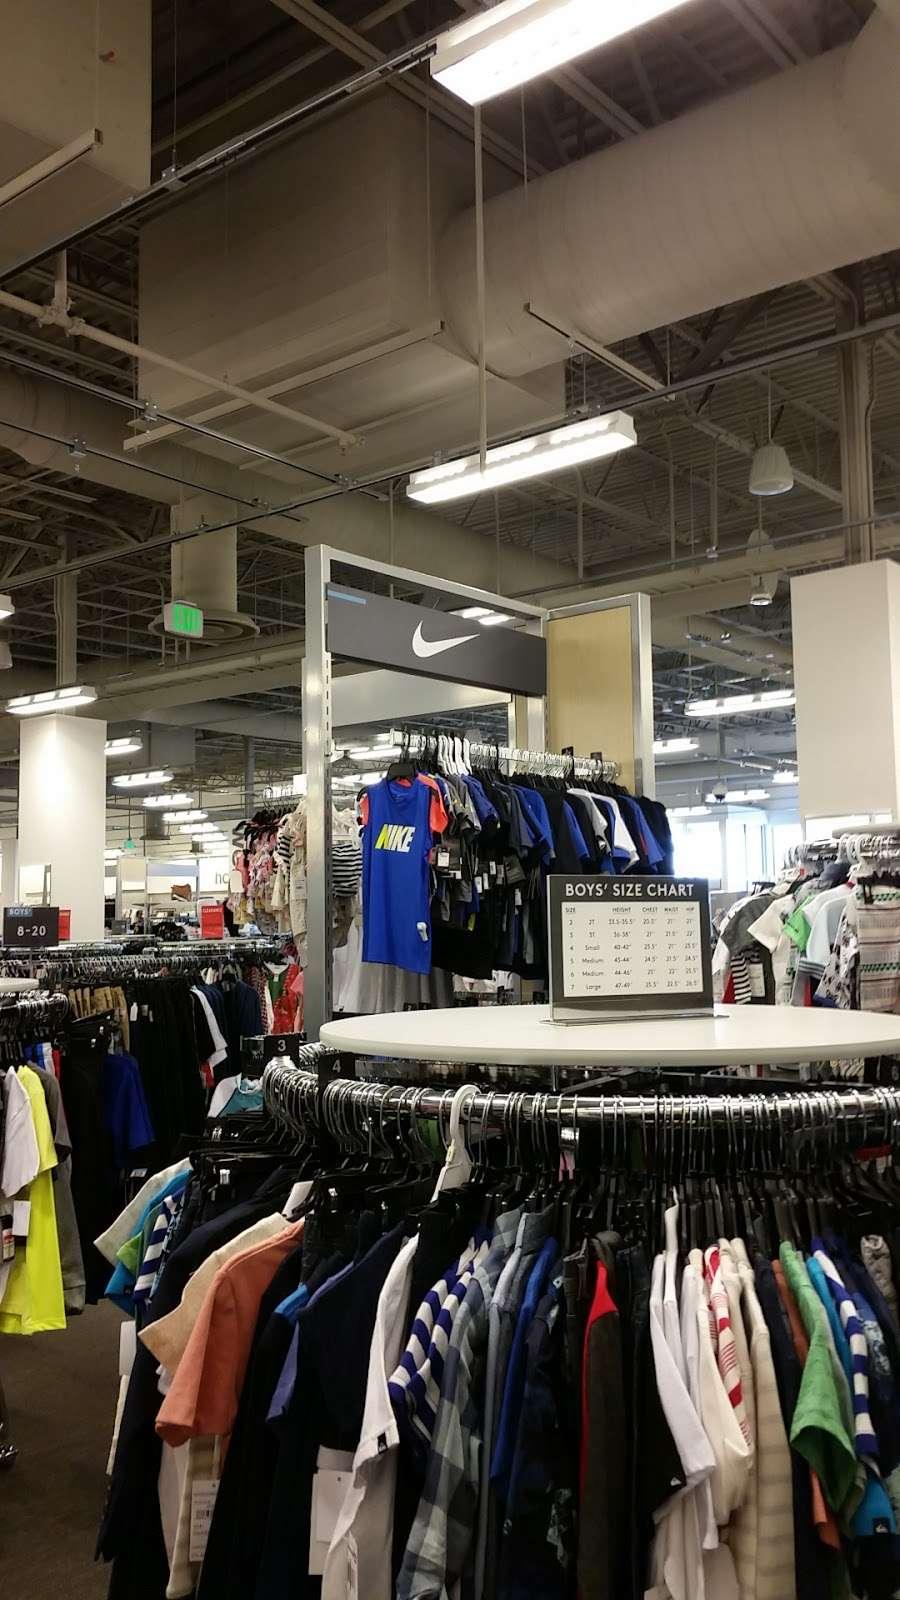 Nordstrom Rack Schererville - clothing store  | Photo 9 of 10 | Address: 185 US-41, Schererville, IN 46375, USA | Phone: (219) 227-3960